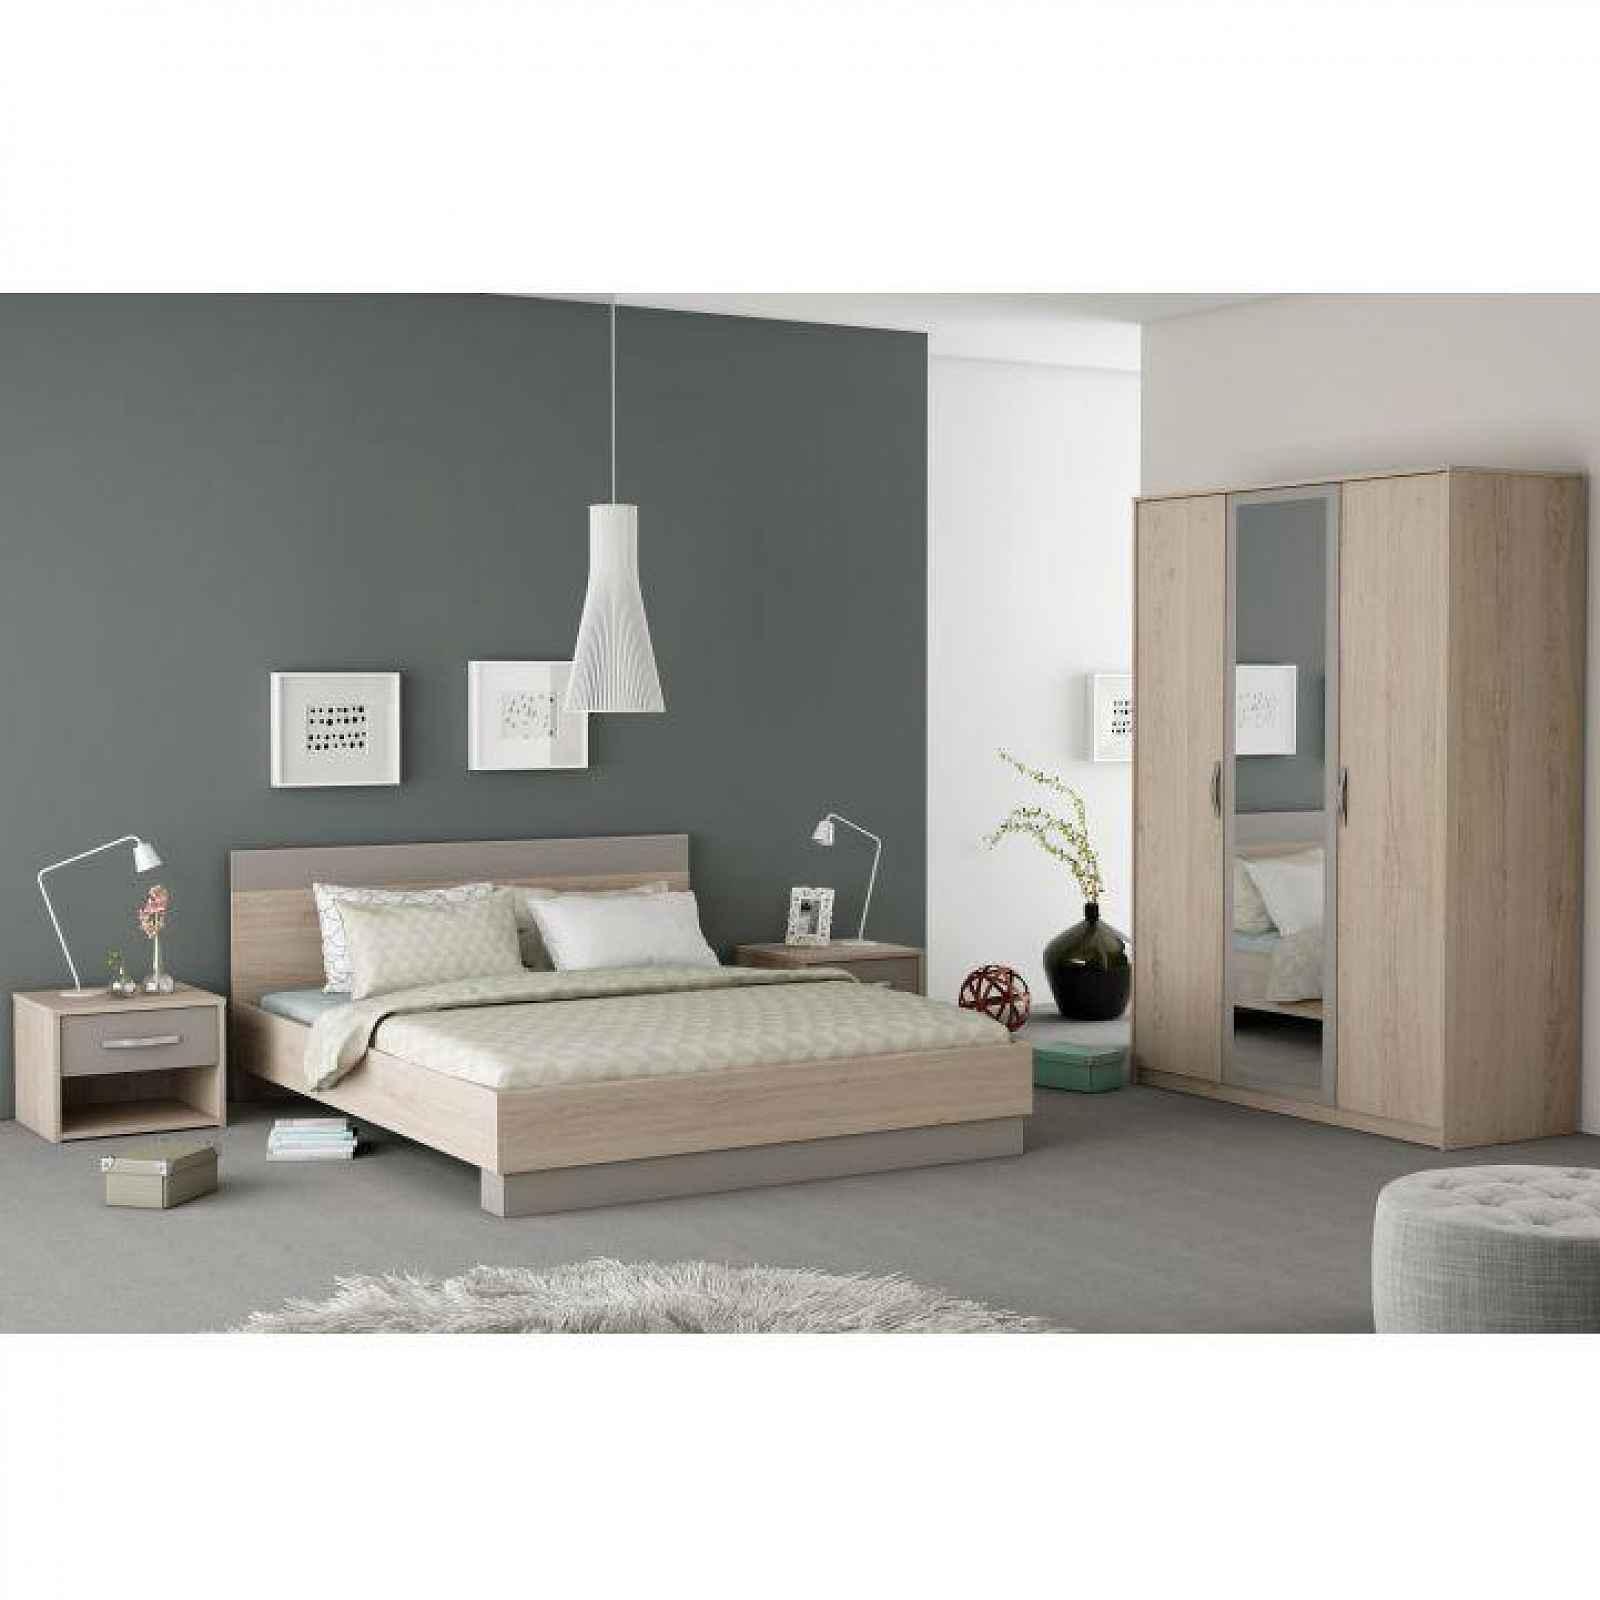 Ložnicový komplet (skříň + postel + 2x noční stolek), dub arizona / šedá, GRAPHIC 0000186746 Tempo Kondela